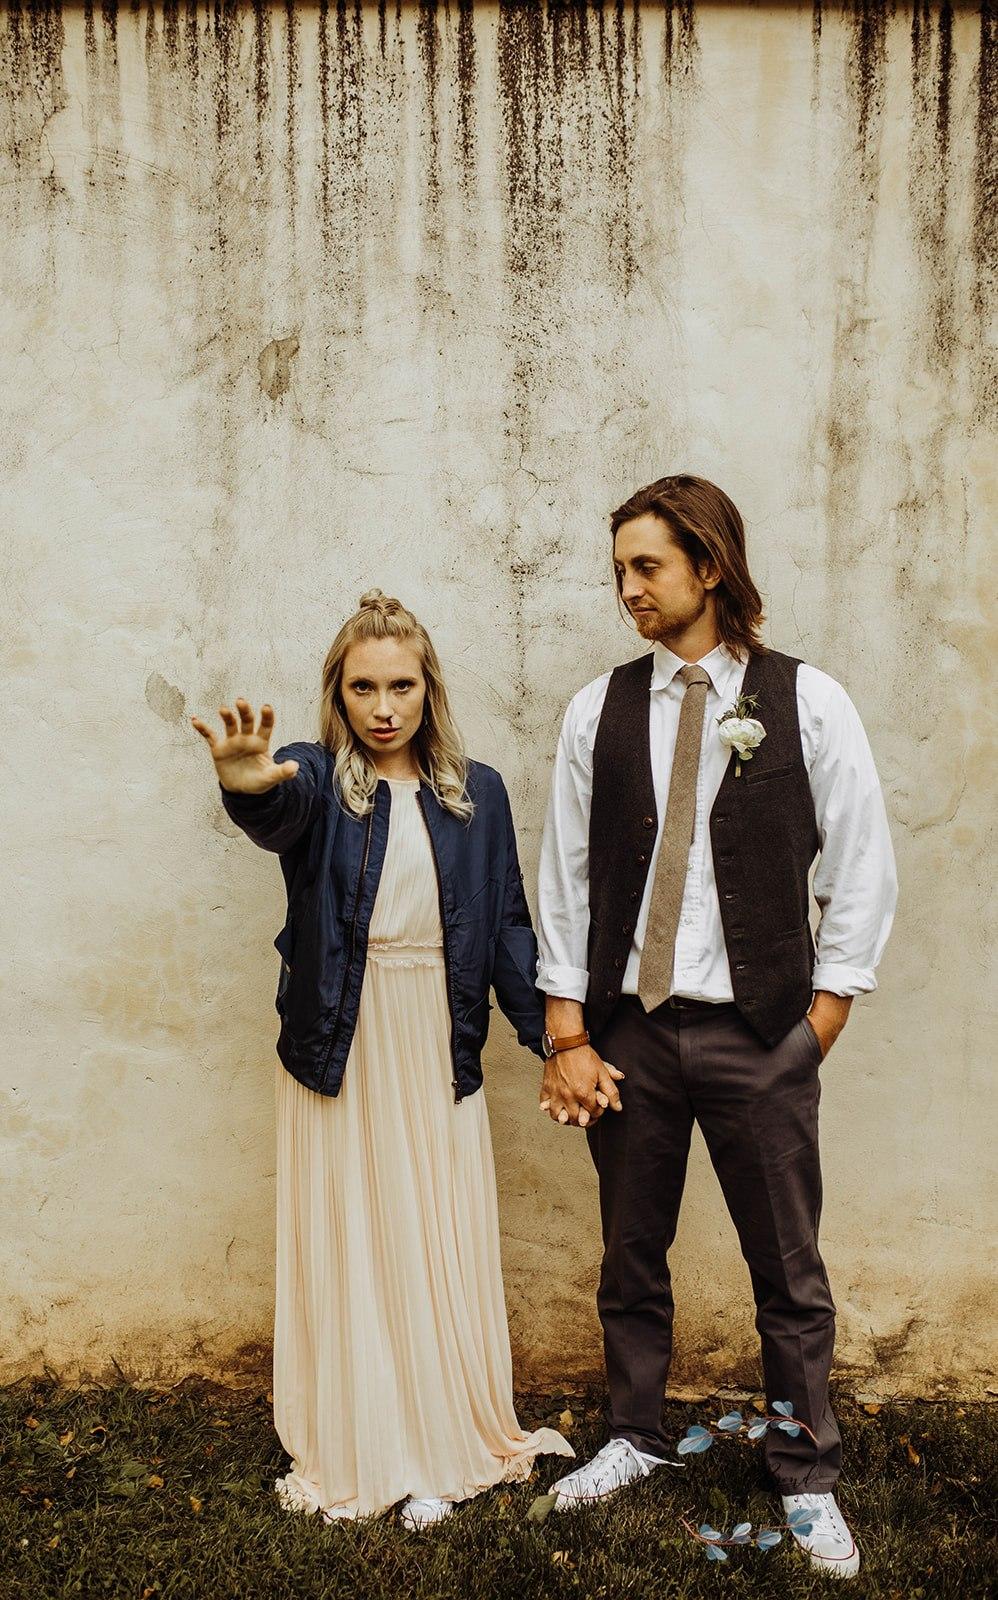 stranger things wedding photo shoot